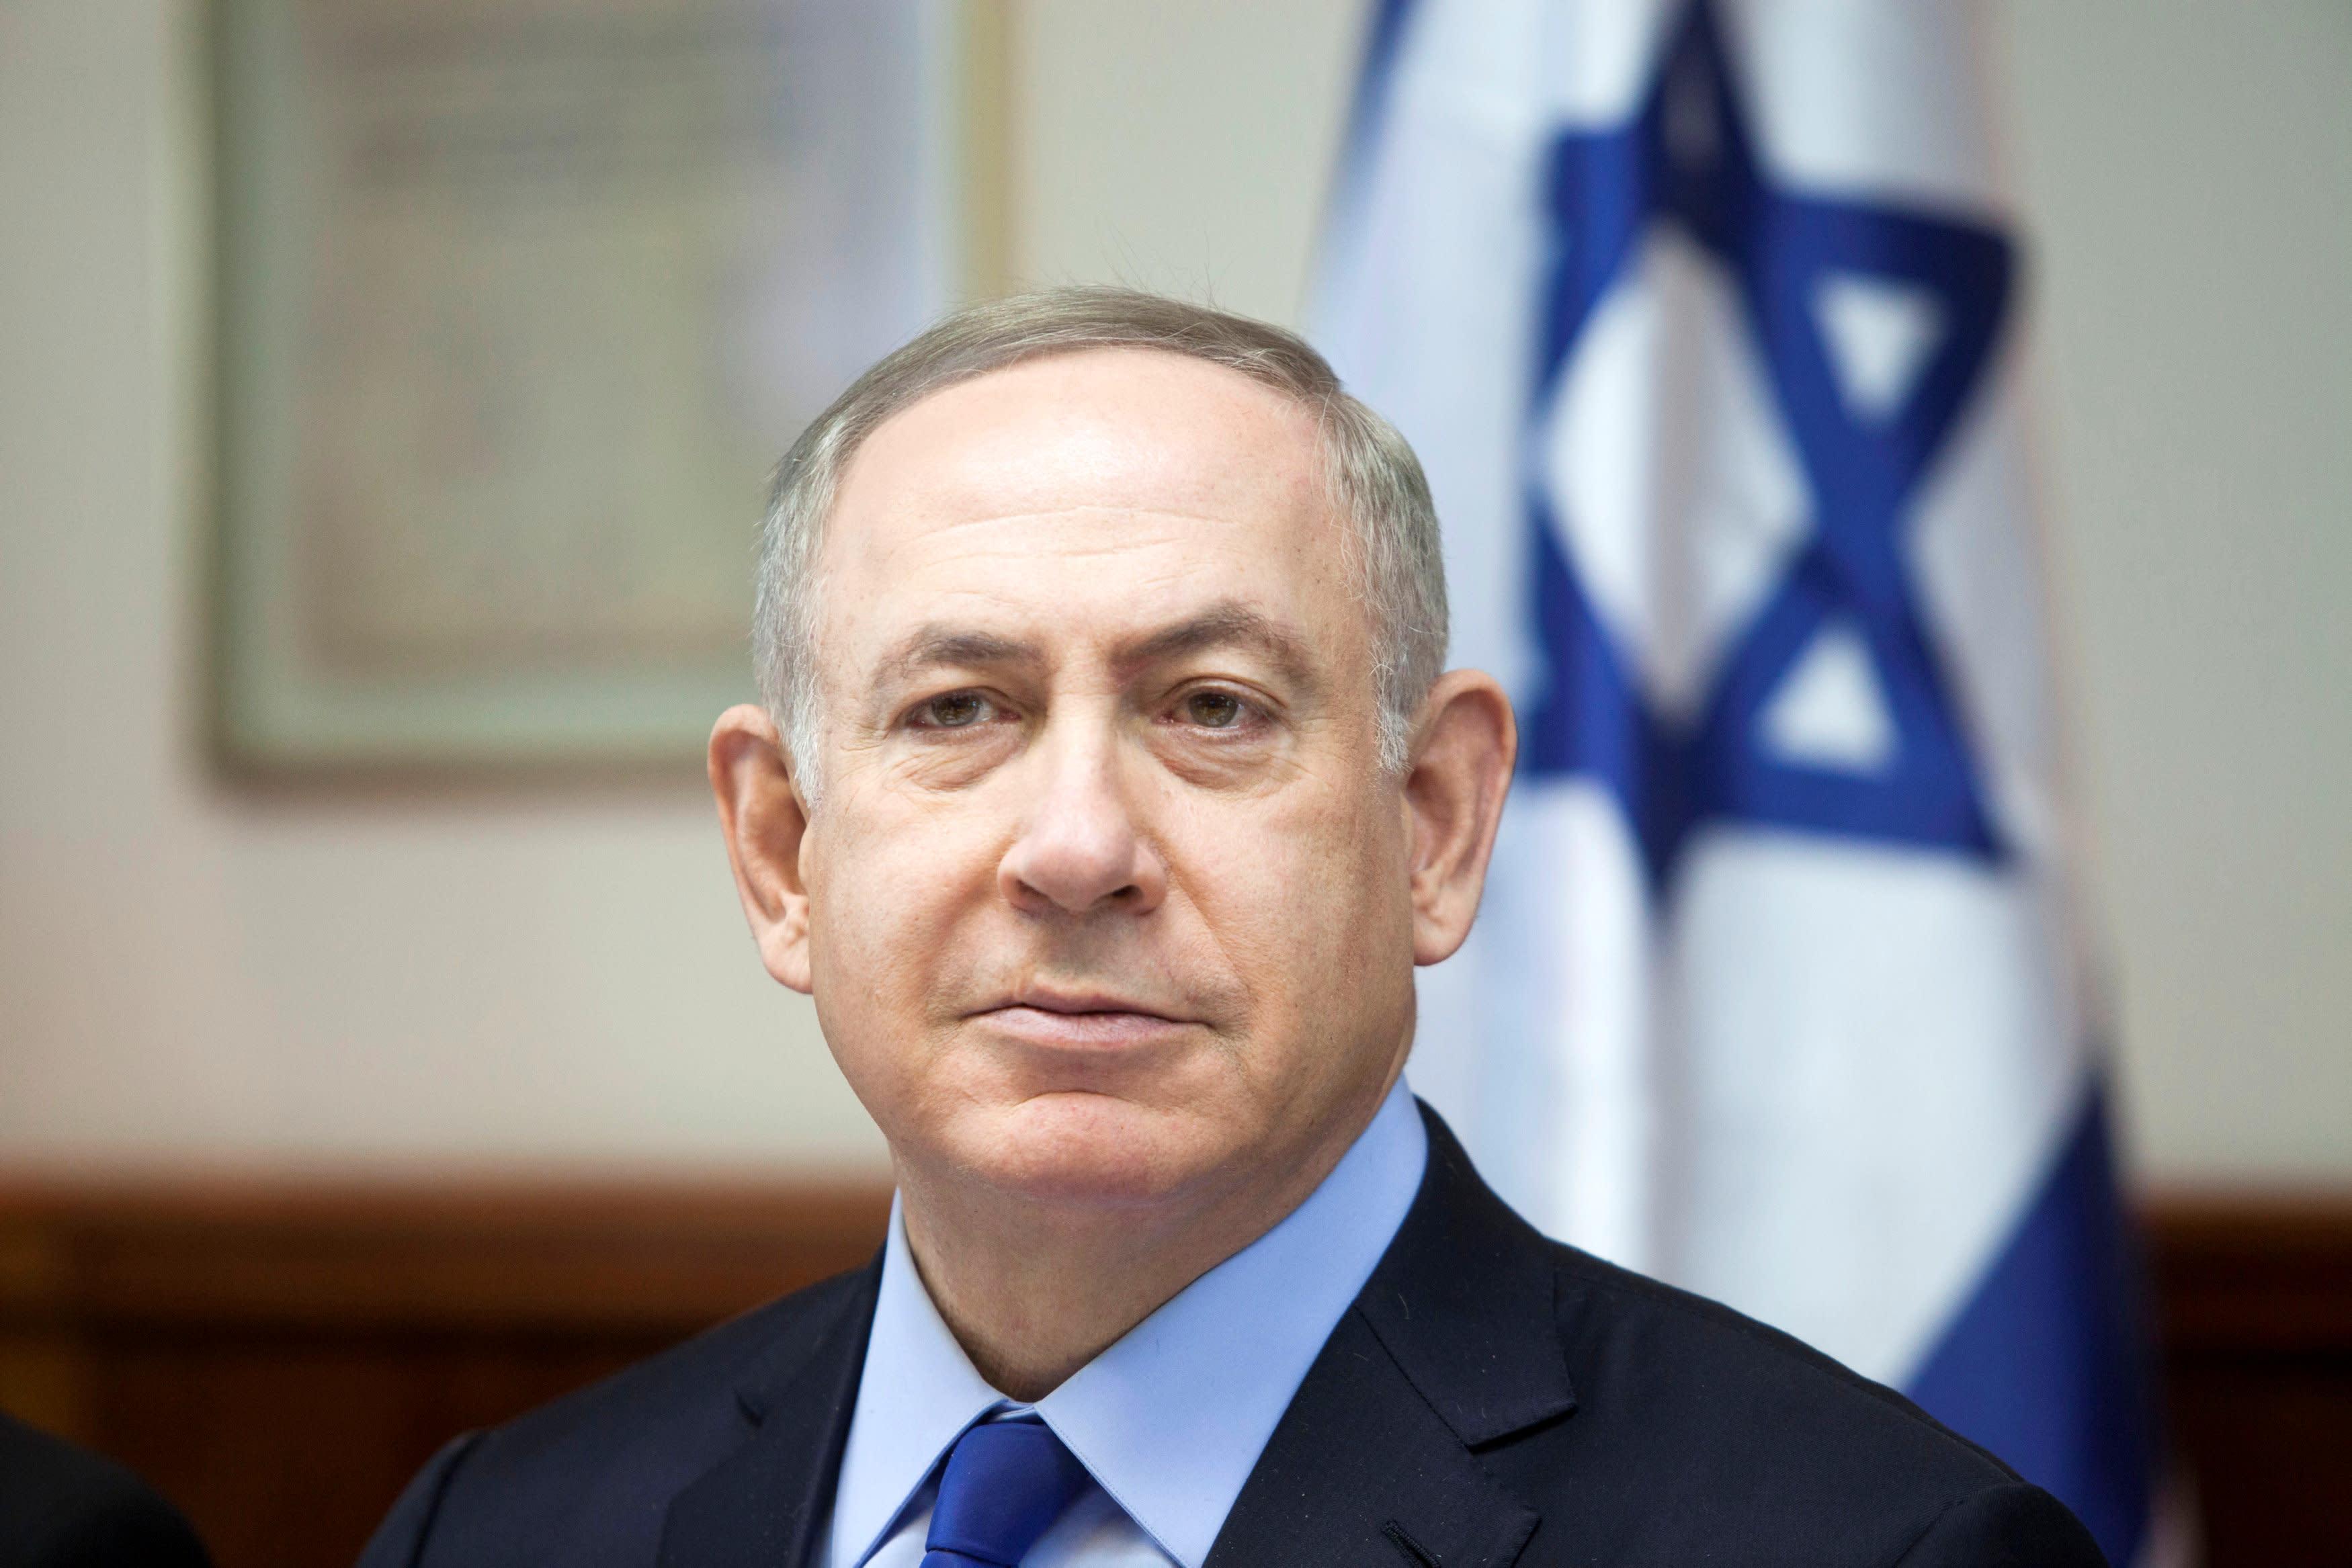 Israeli Prime Minister Benjamin Netanyahu attends the weekly cabinet meeting at his Jerusalem office December 25, 2016. REUTERS/Dan Balilty/Pool